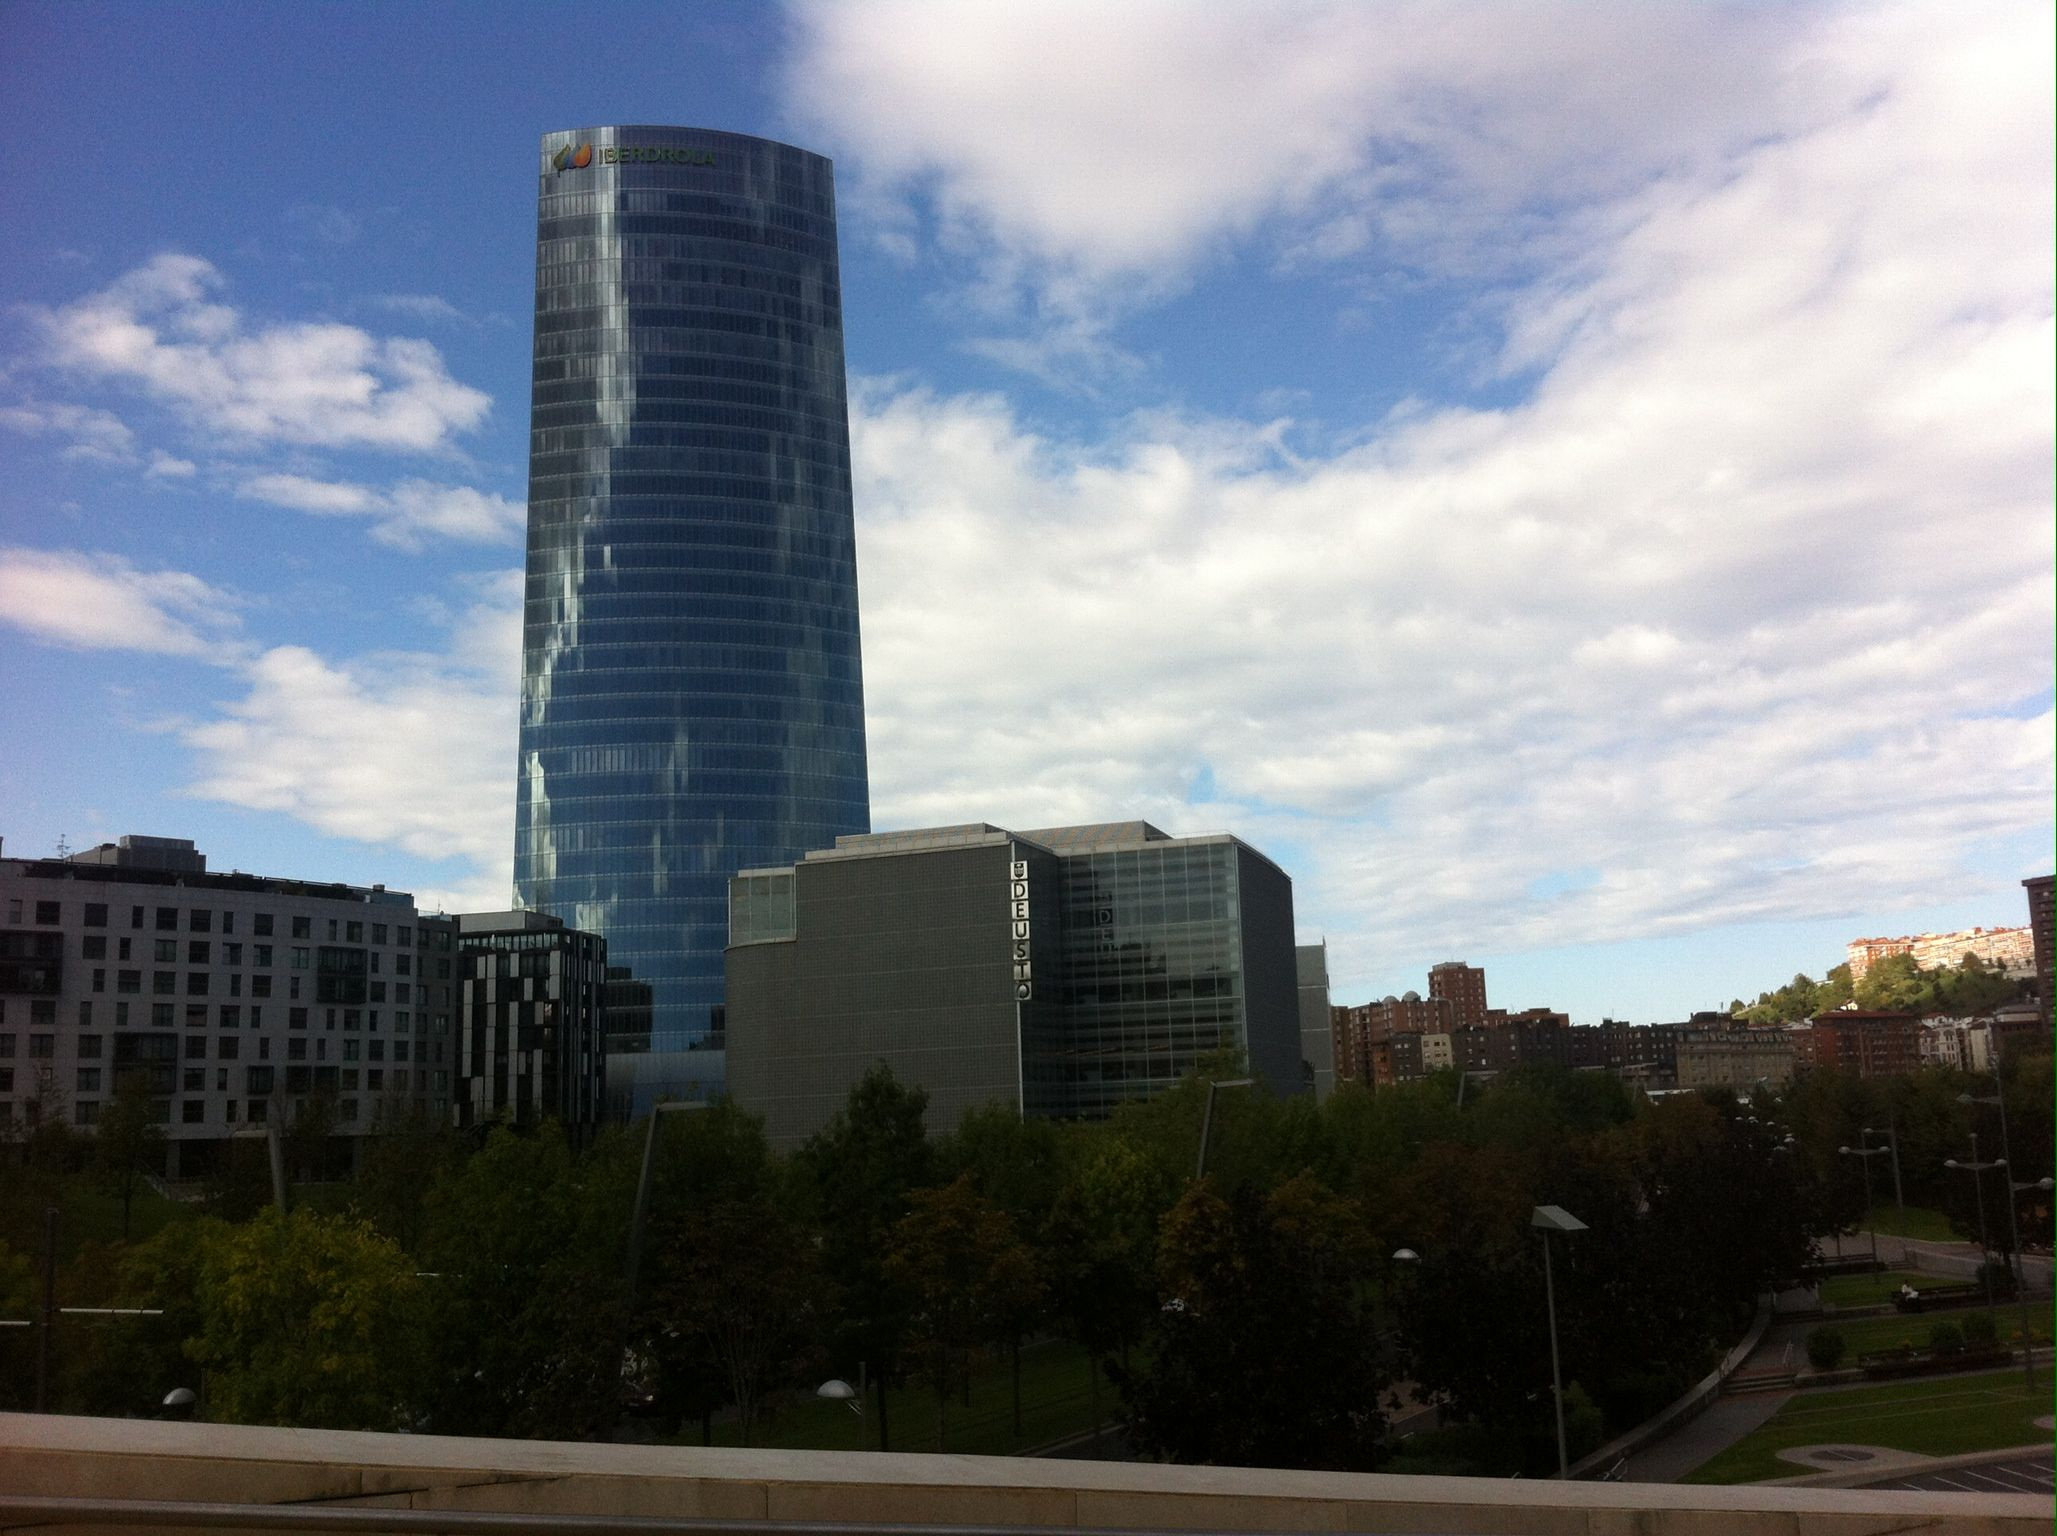 Bilbao 2013 grandes cambios!!! Espectacular